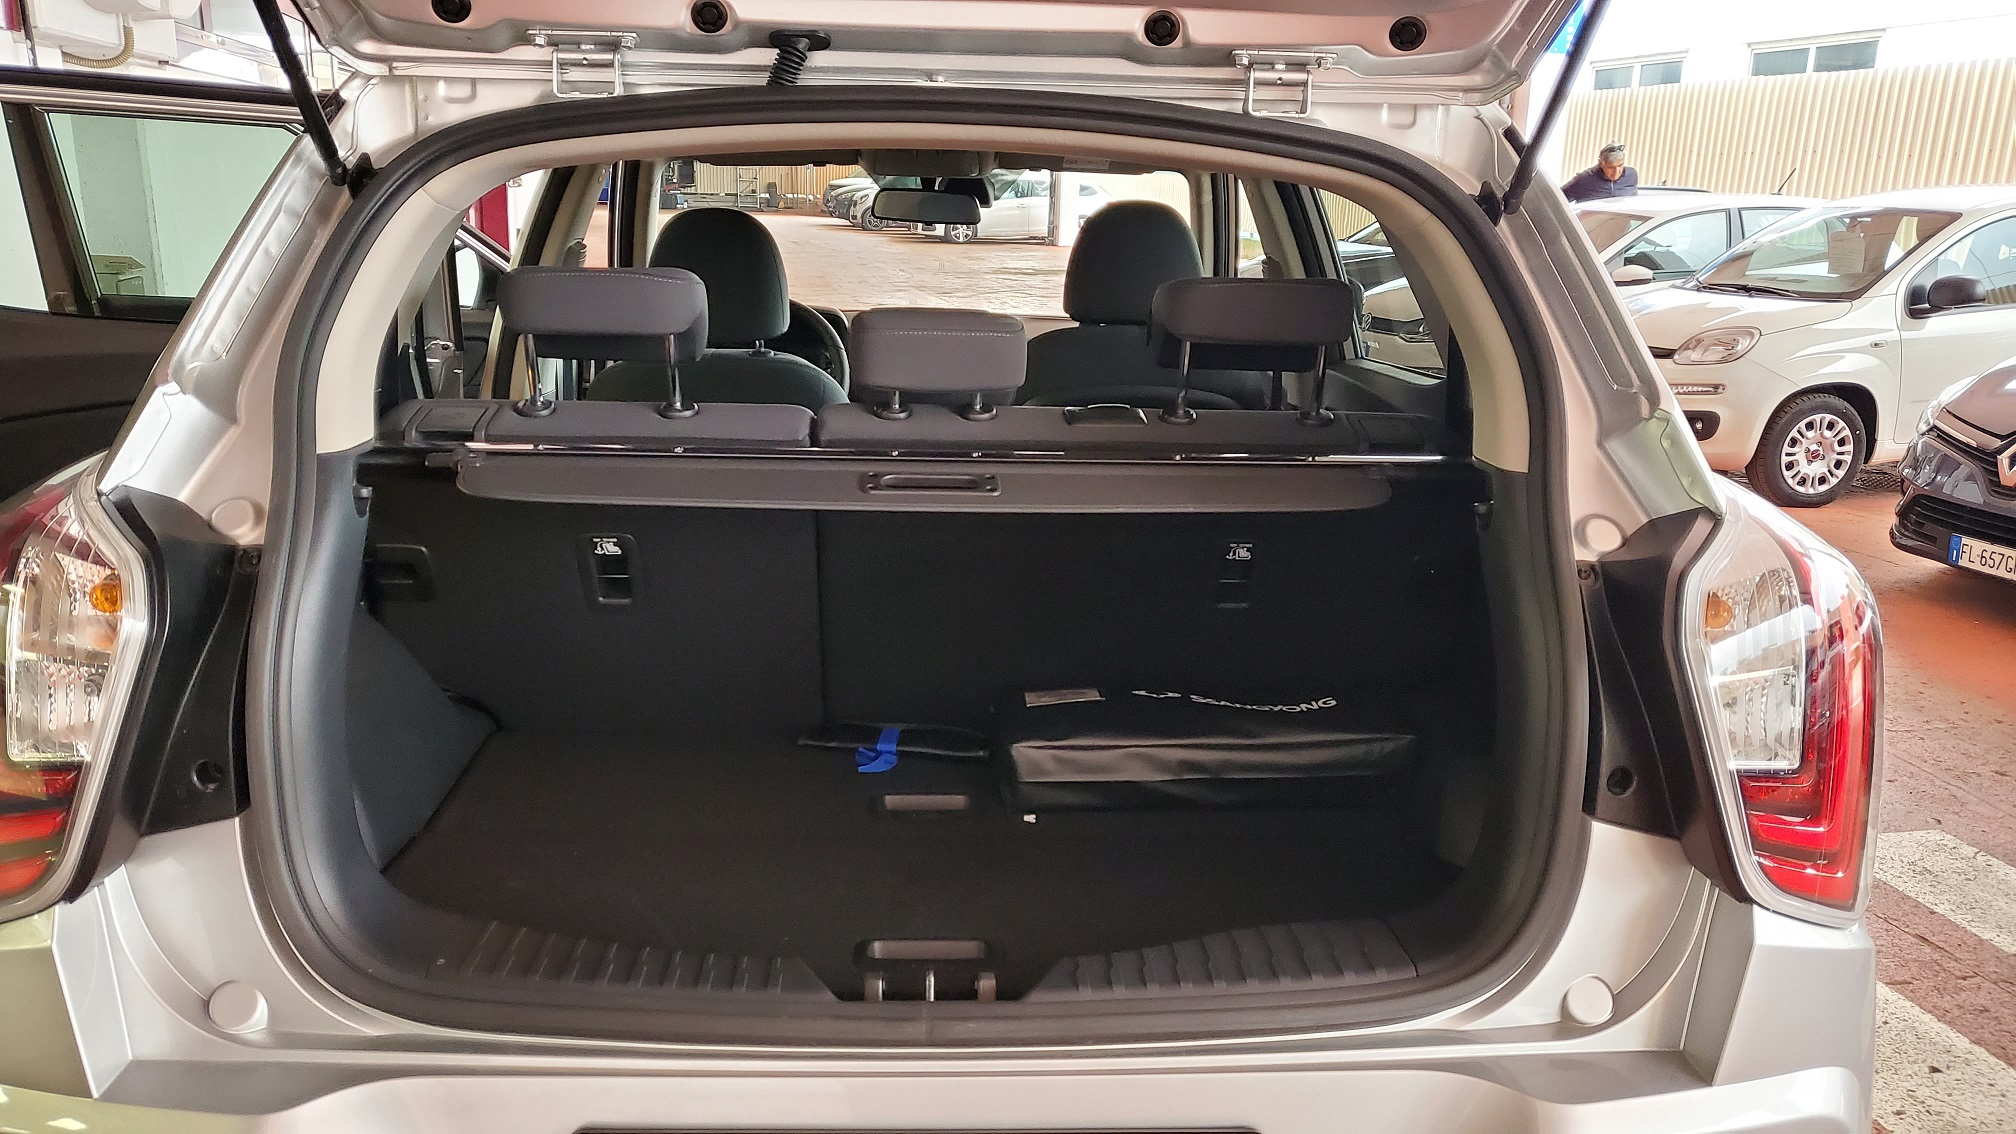 SSANGYONG Tivoli 1.6 diesel 2WD Comfort Diesel usata - 9